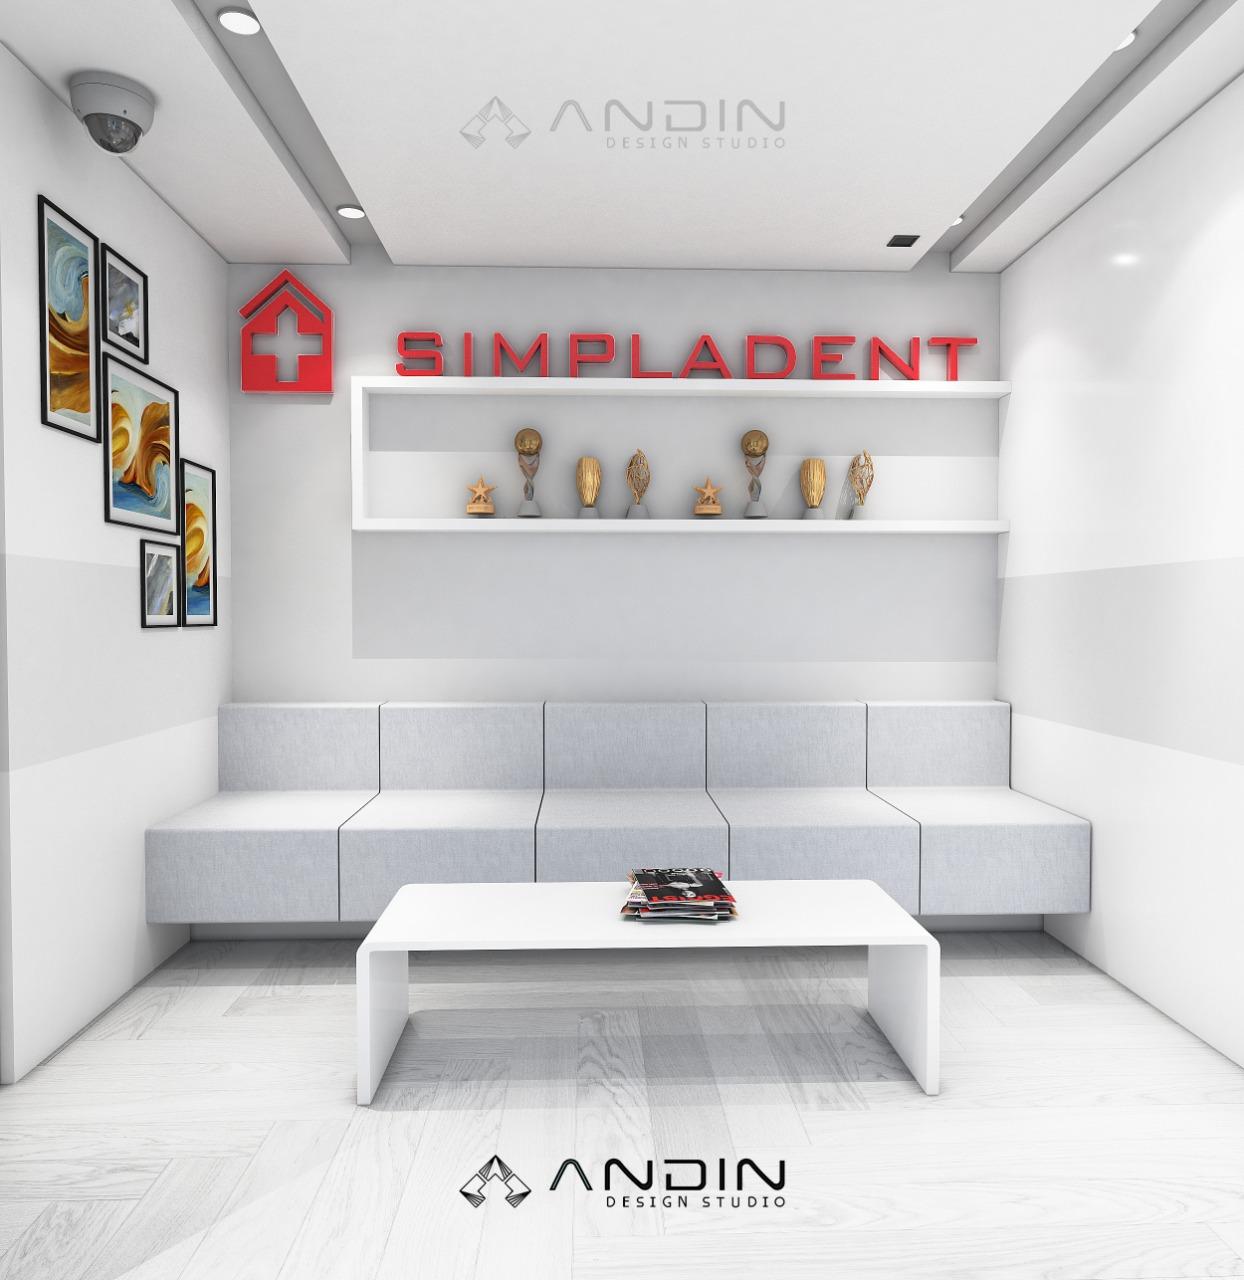 SIMPLAMENT 3D